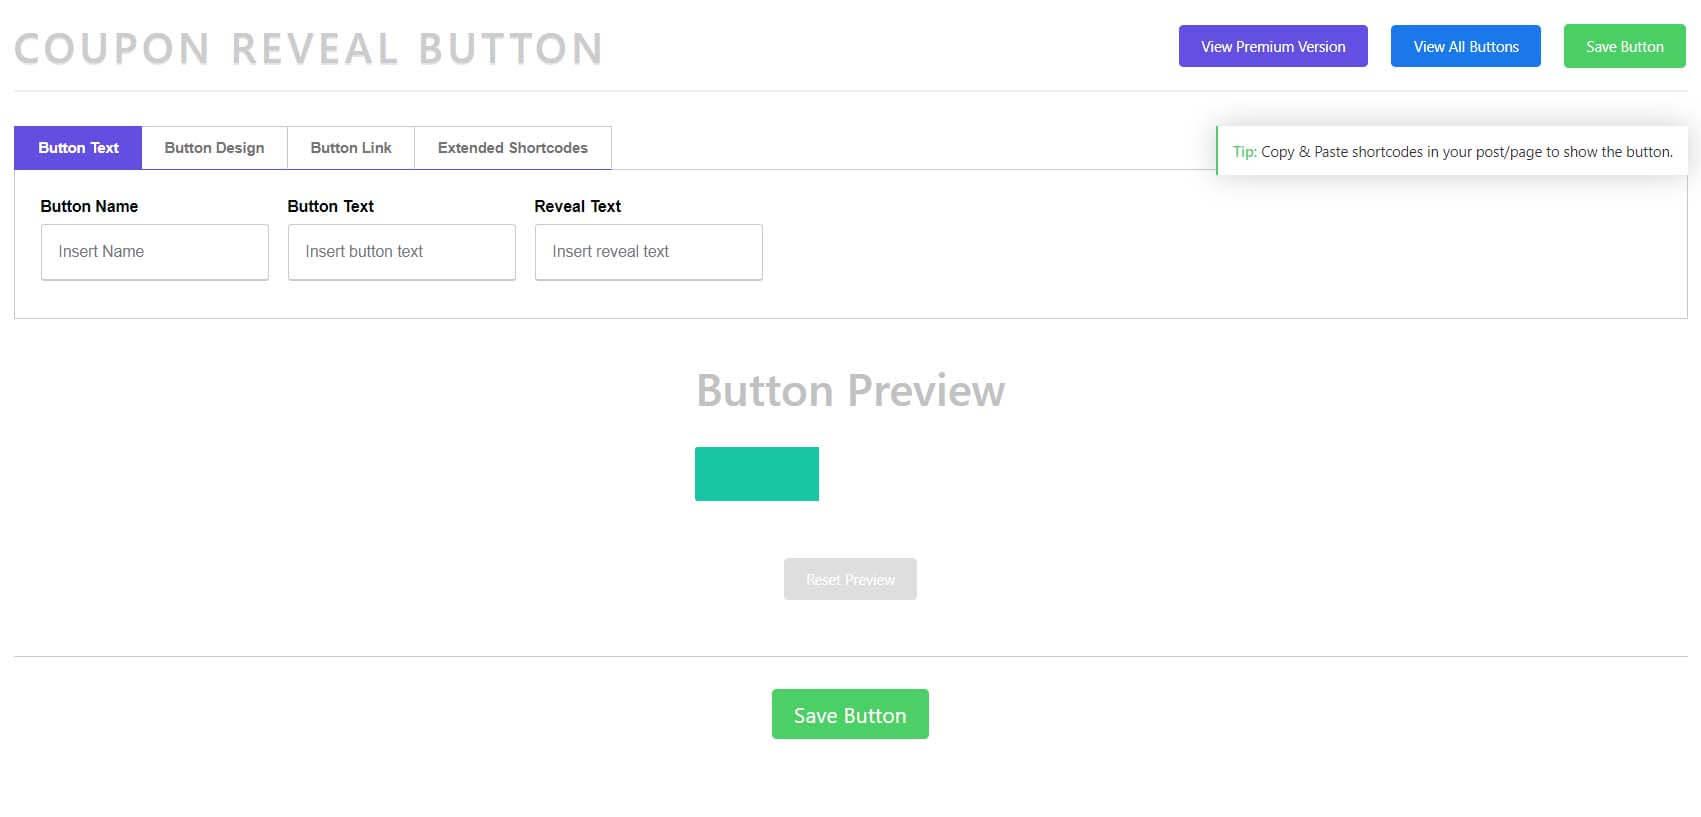 Coupon Reveal Button